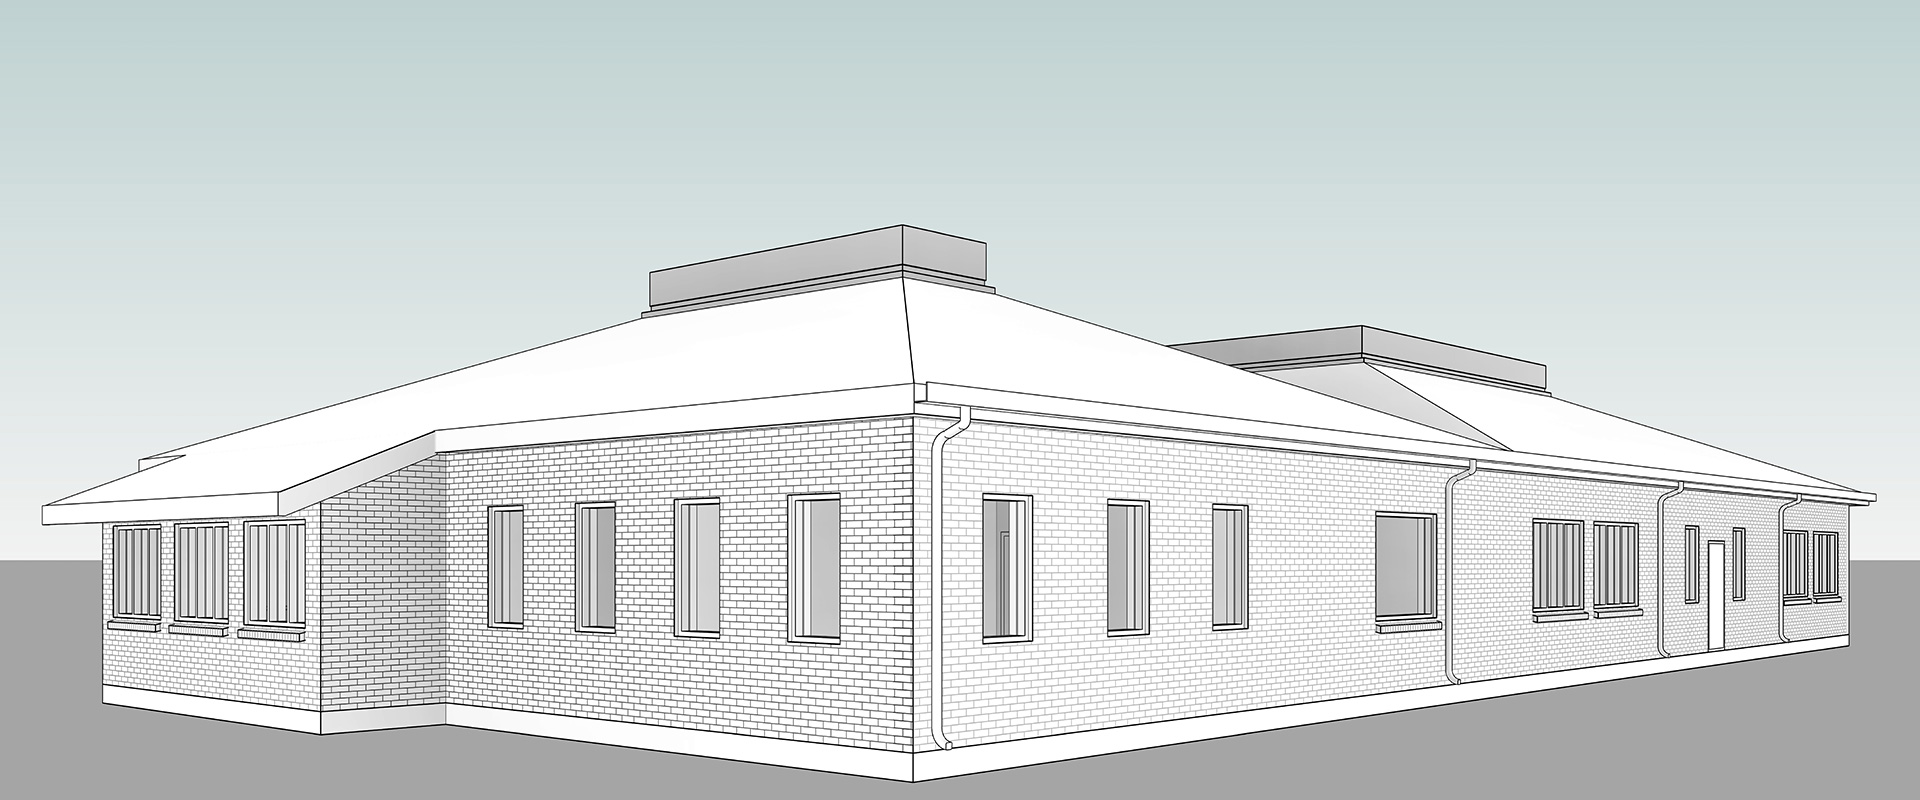 Architectural_Revit_Modeling_Birken_Inspection-Lab_BIM_Project_by_United-BIM